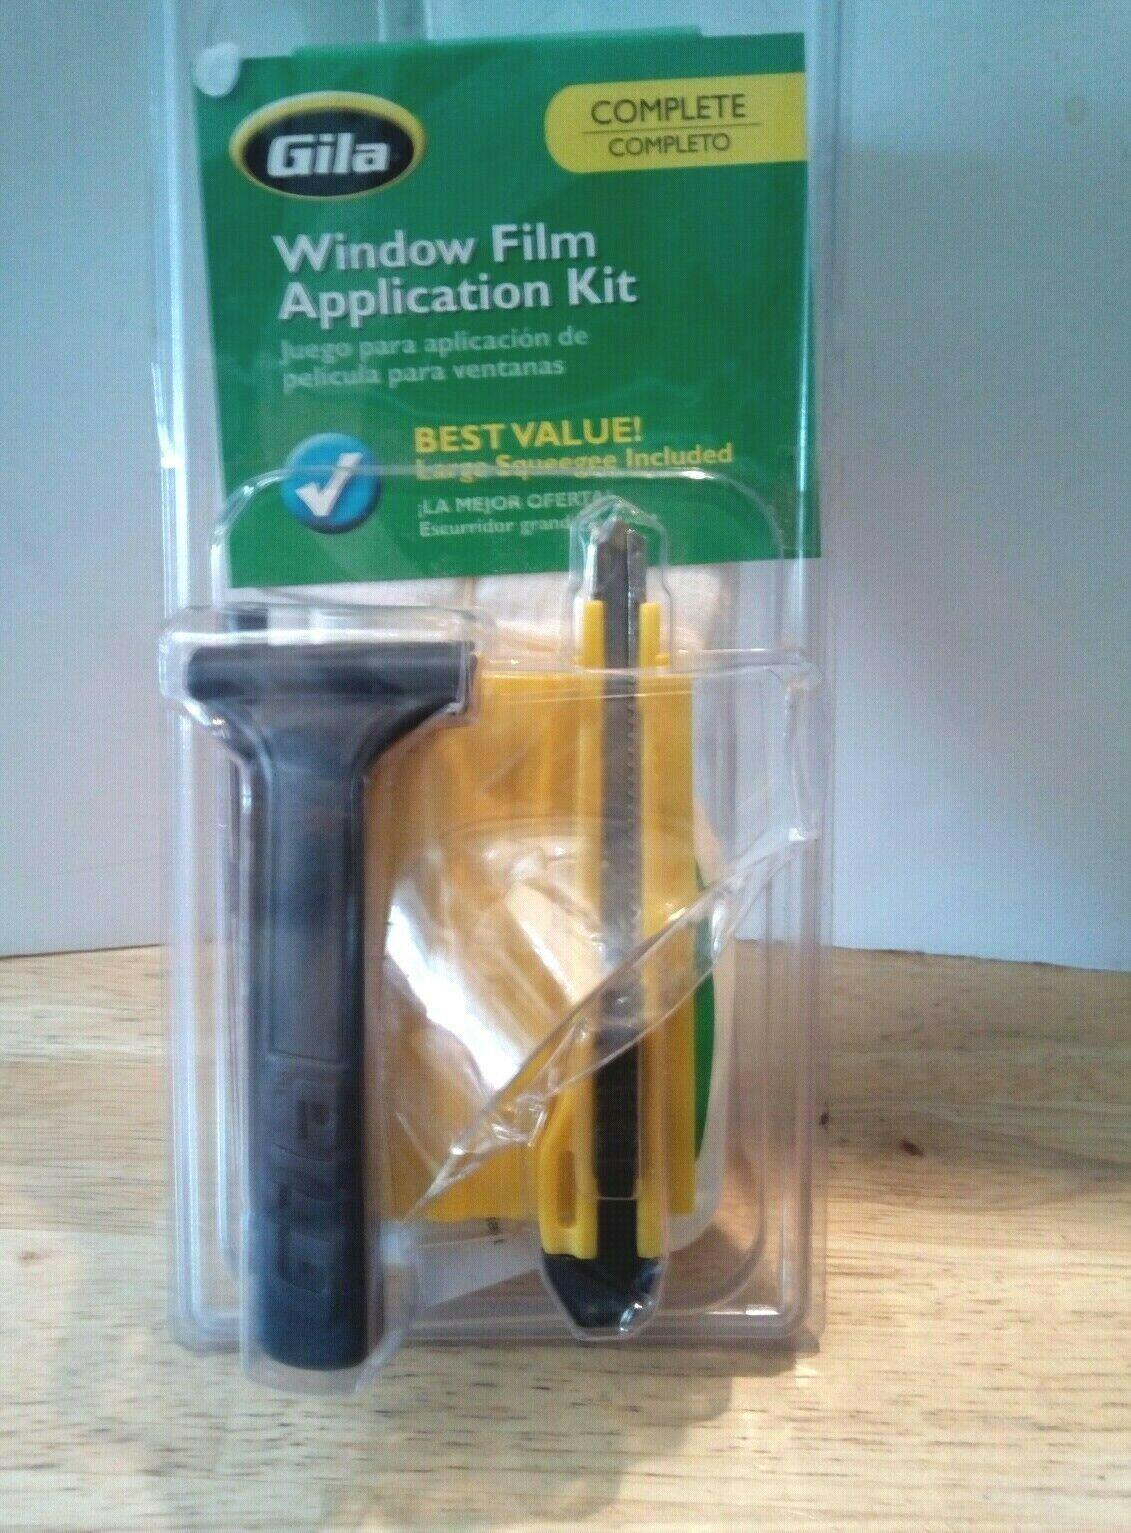 Gila Window Film Application Kit RTK500SM New in Box - $19.79